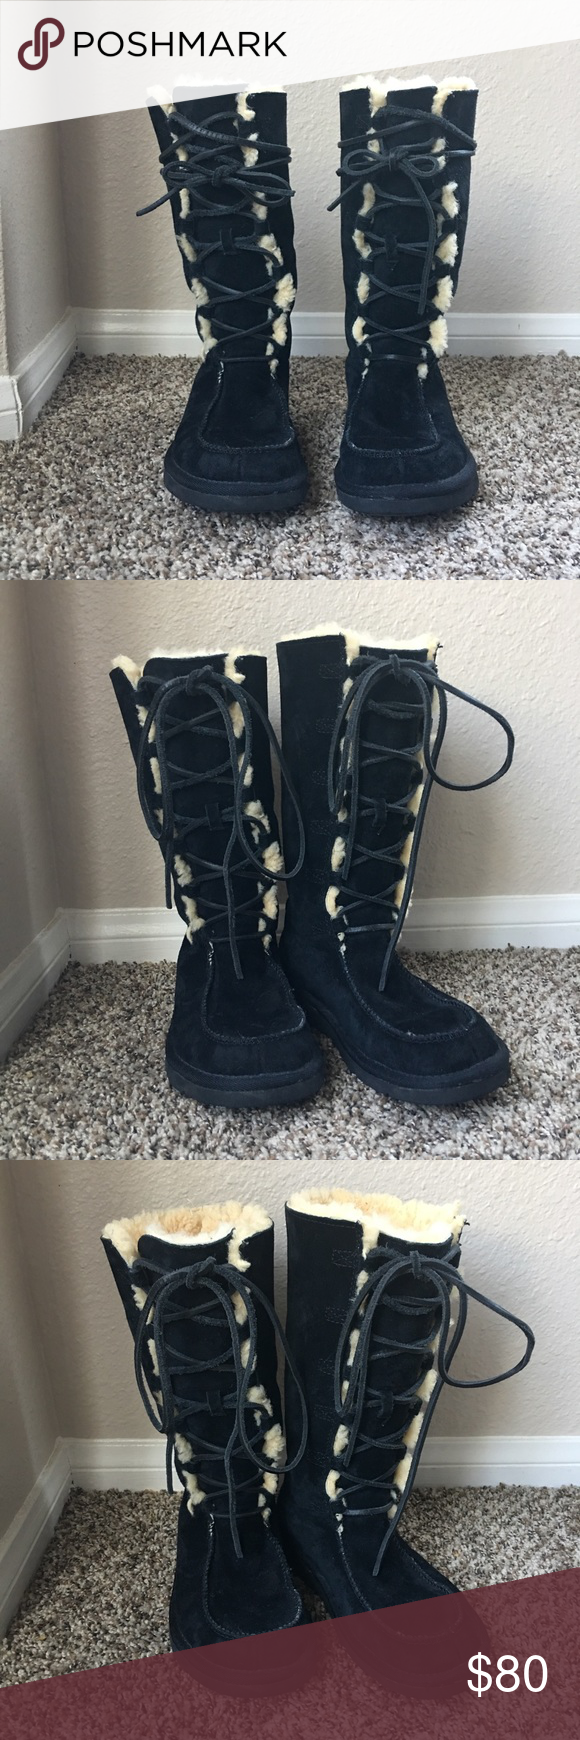 dfcc3a07ba1 closeout black lace up ugg boots 439c5 ebda2